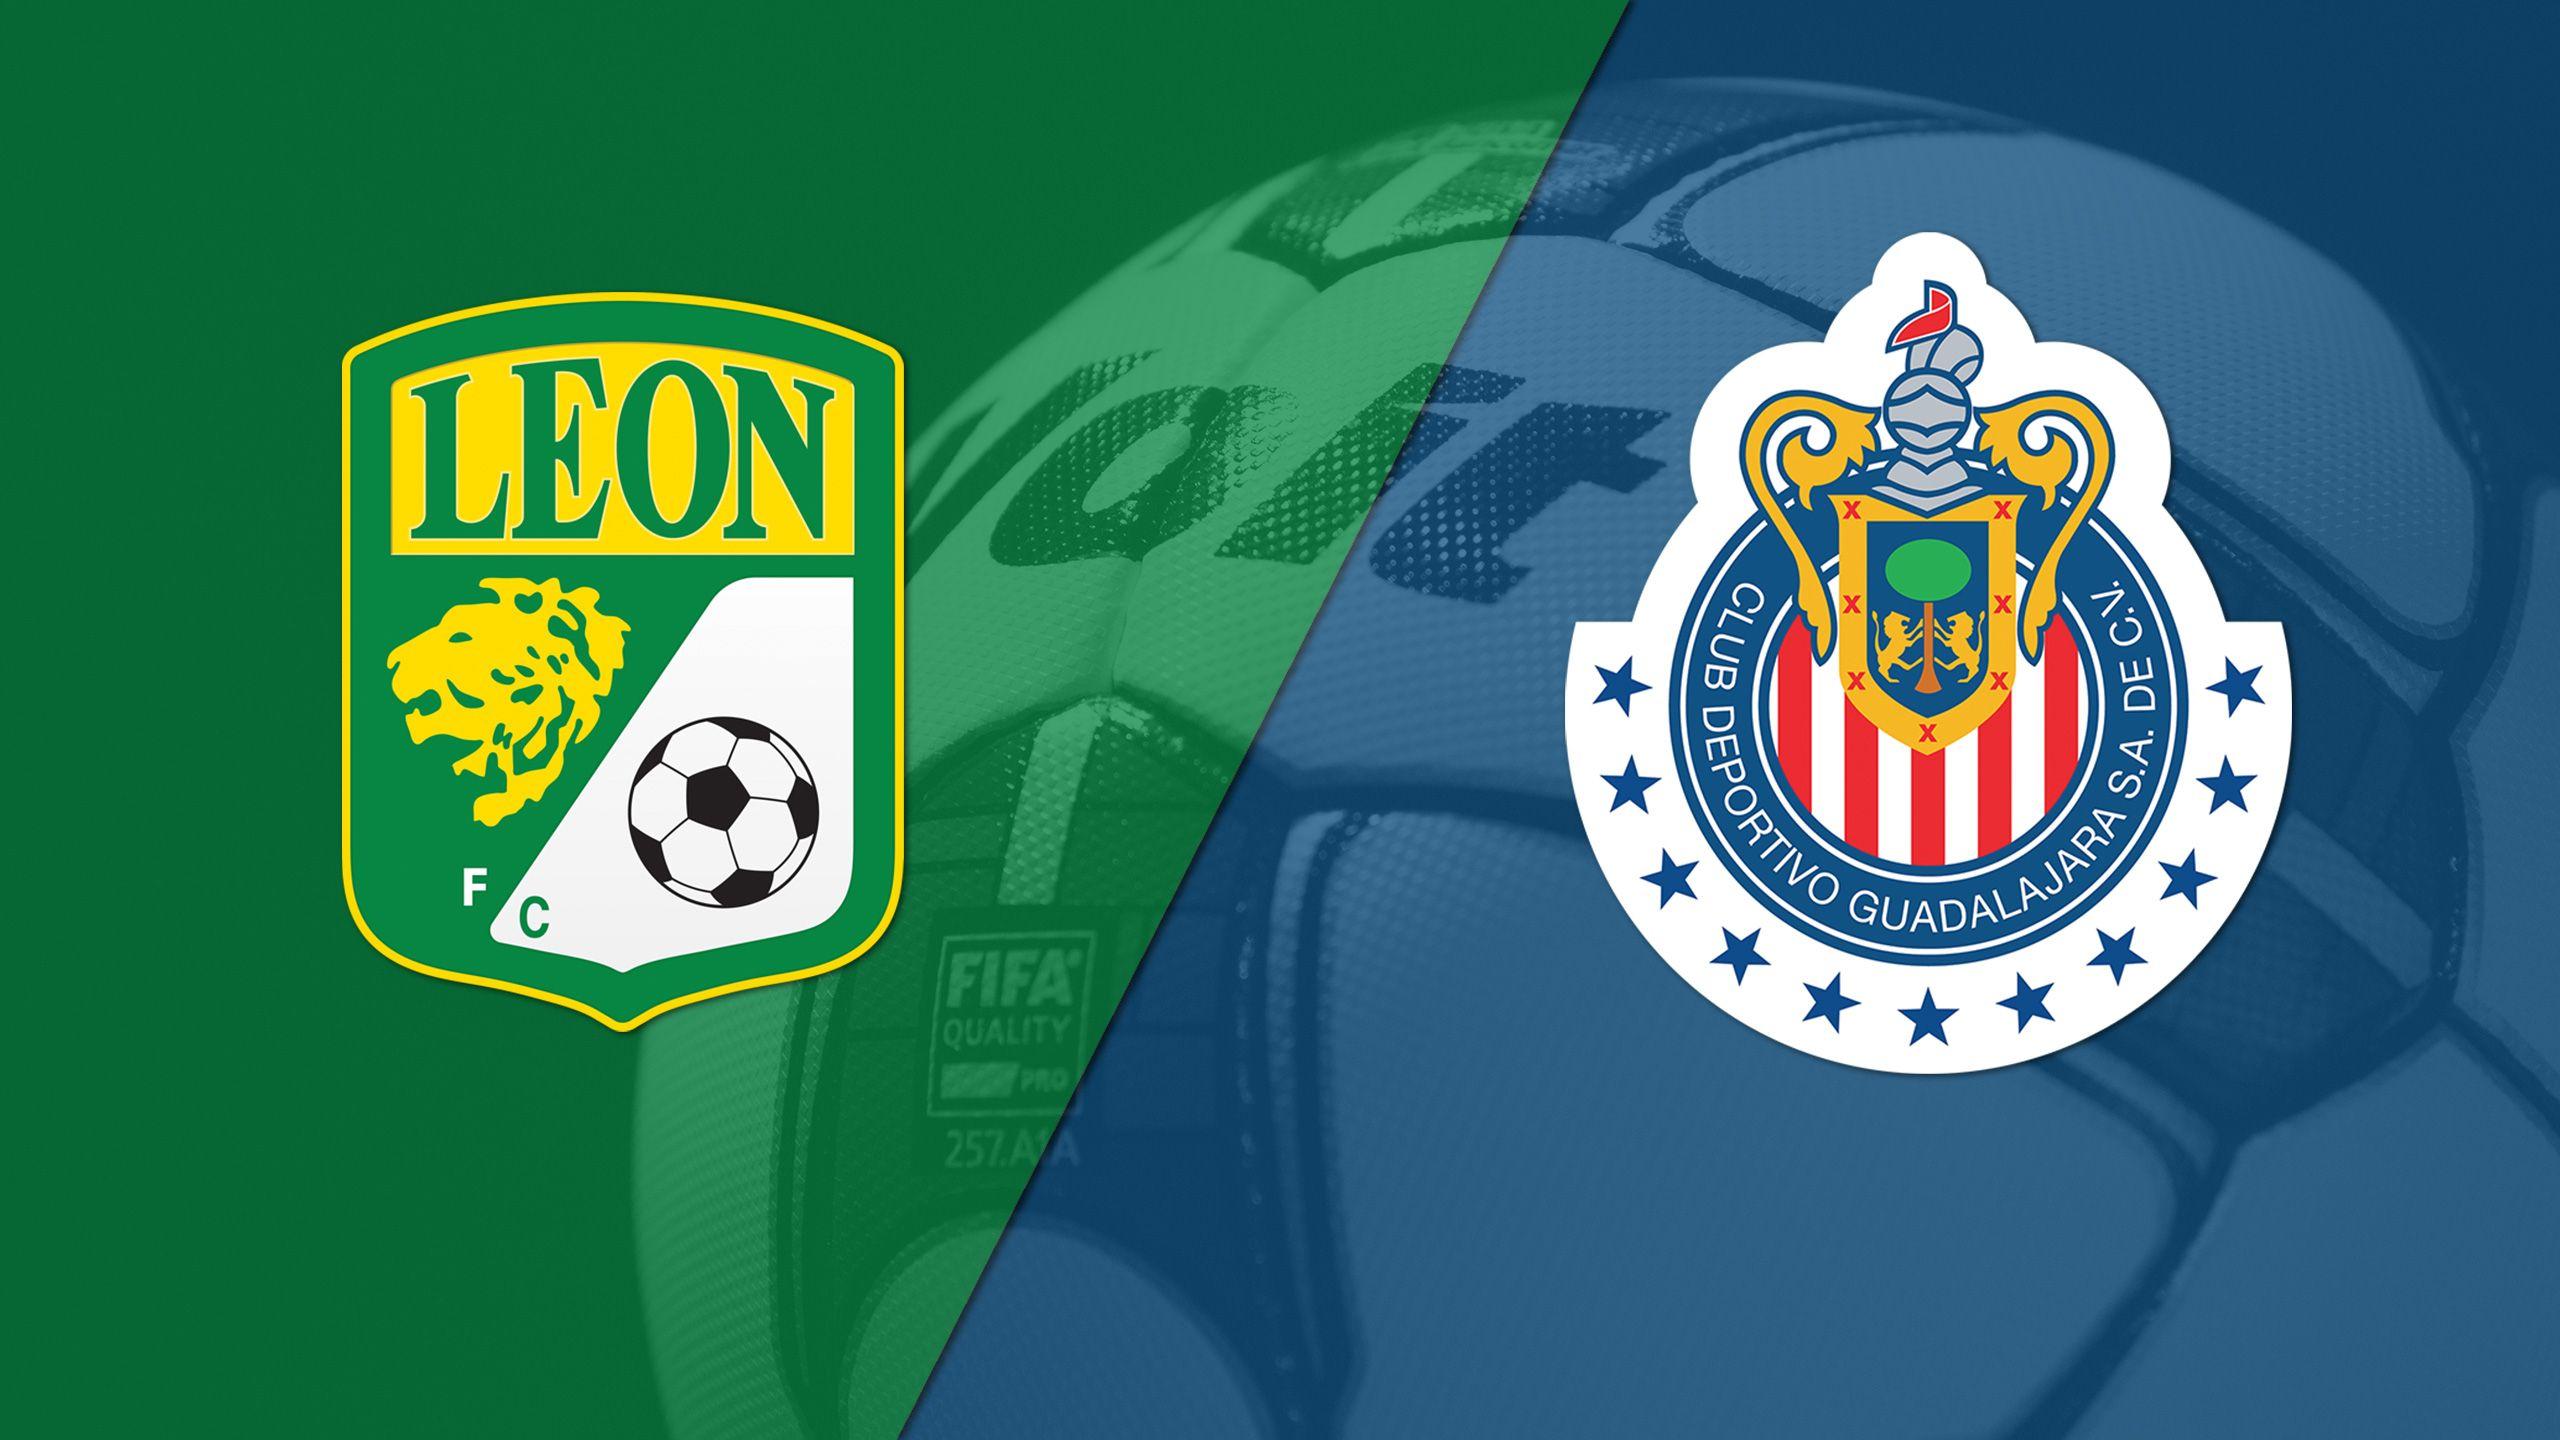 In Spanish - Leon vs. Chivas de Guadalajara (Matchday #17) (Liga MX)